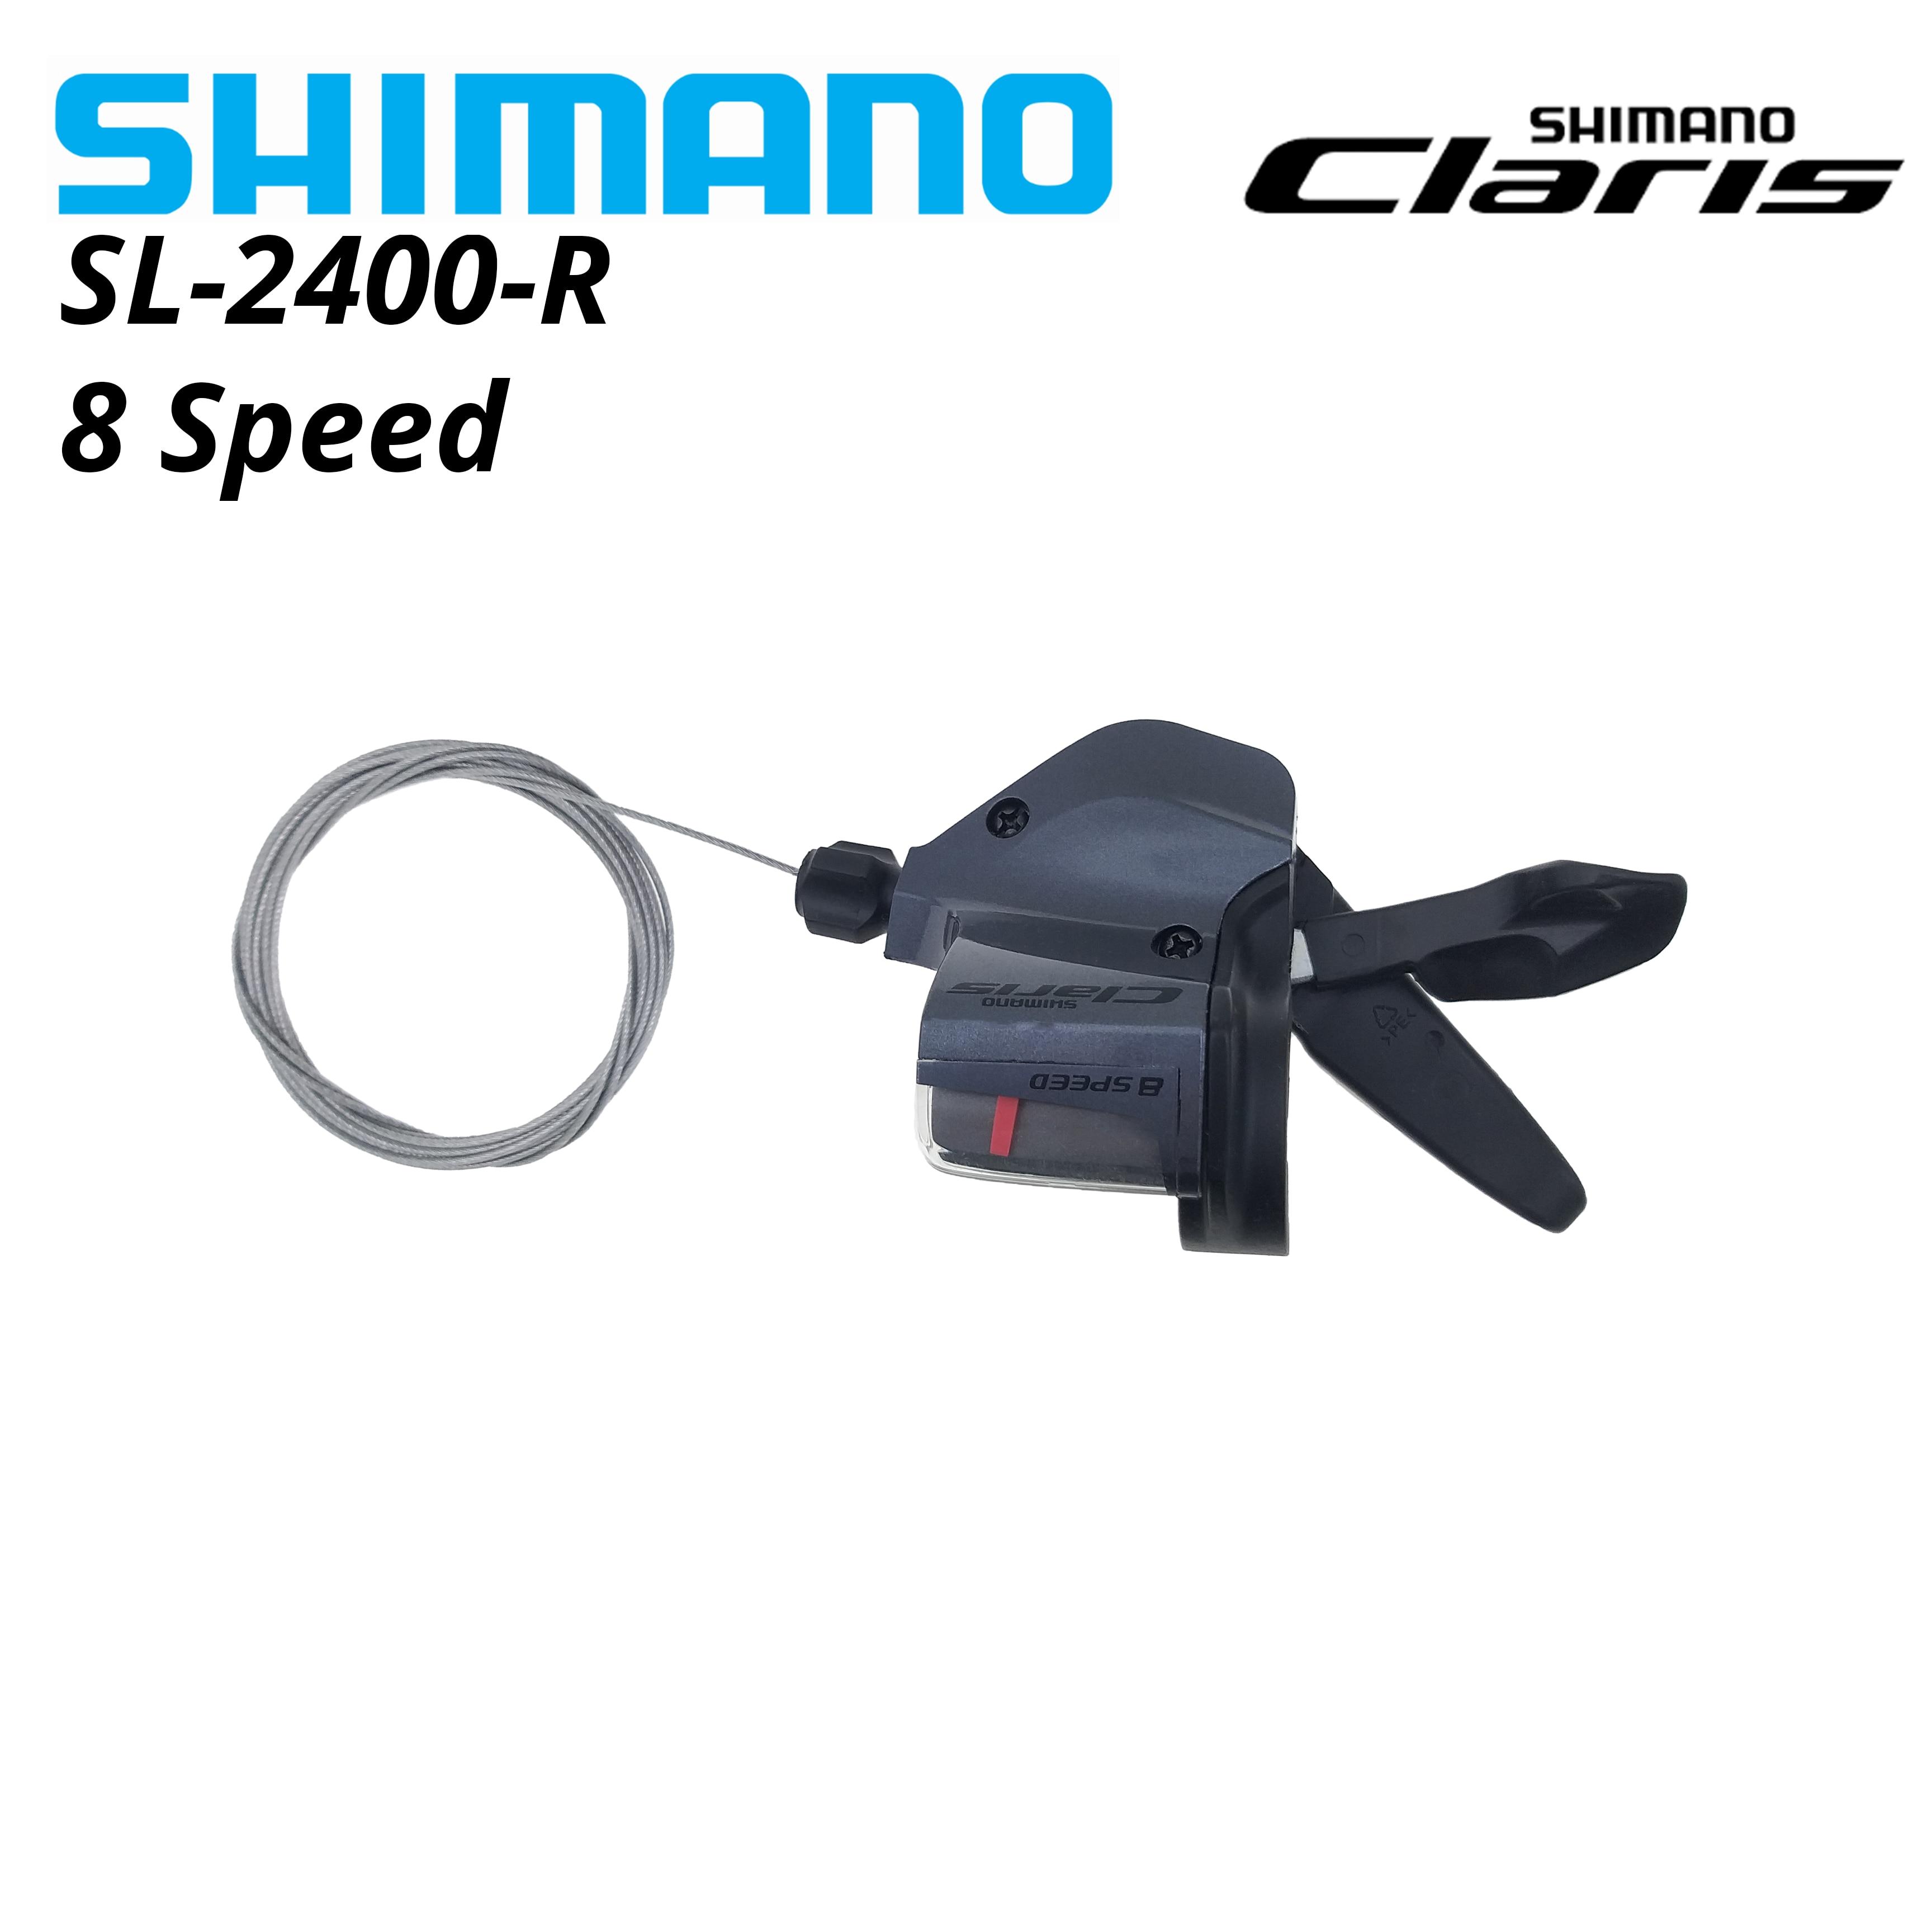 Shimano-SL-2400 claro con palanca de cambio, Barra plana DE 8 velocidades, 2400,...